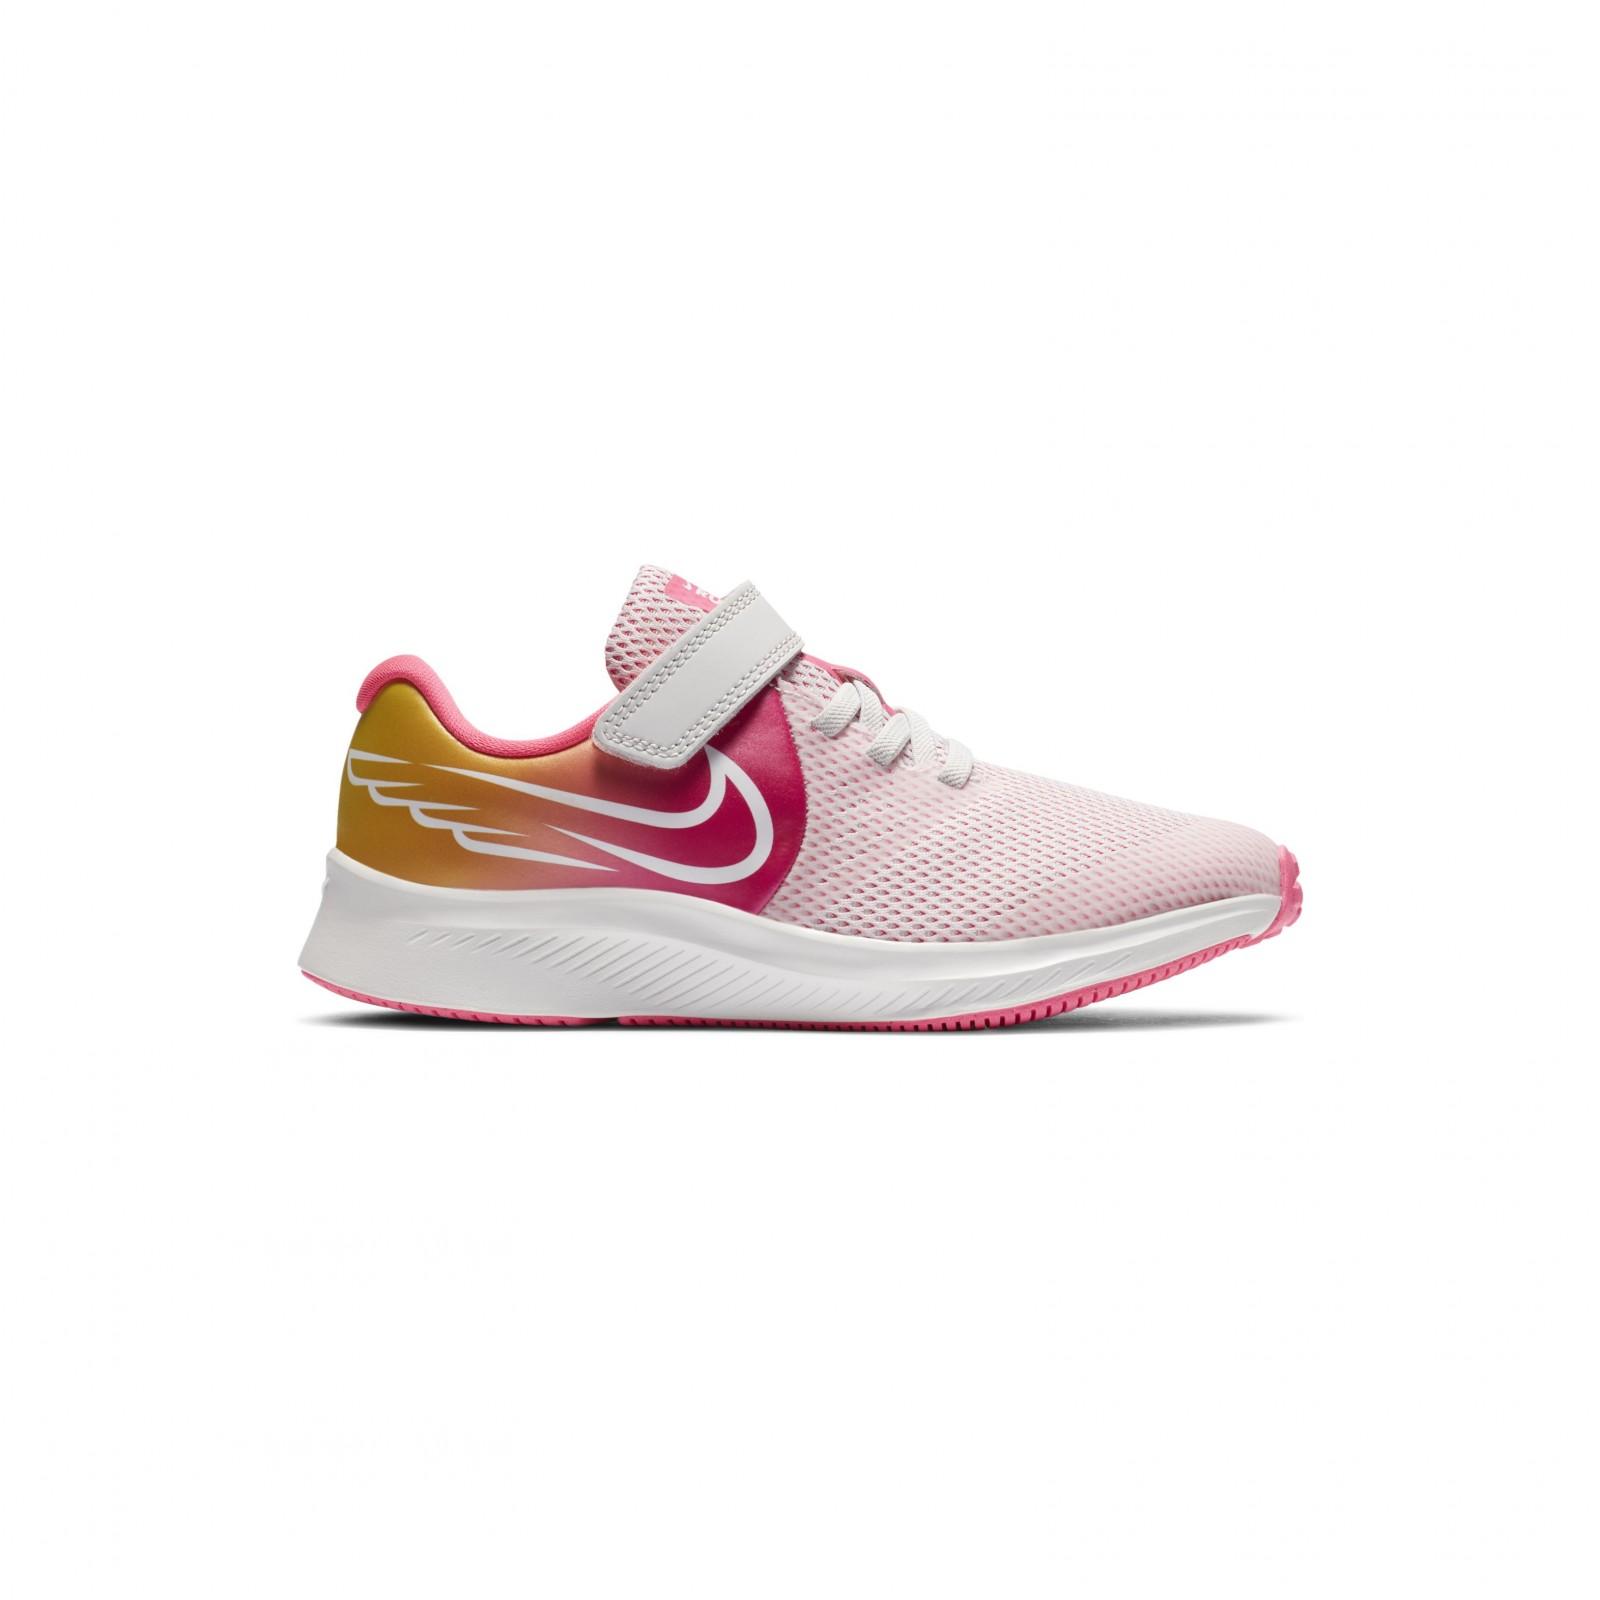 Nike star runner 2 sun (psv) PLATINUM TINT/SUMMIT WHITE-HYPER PINK